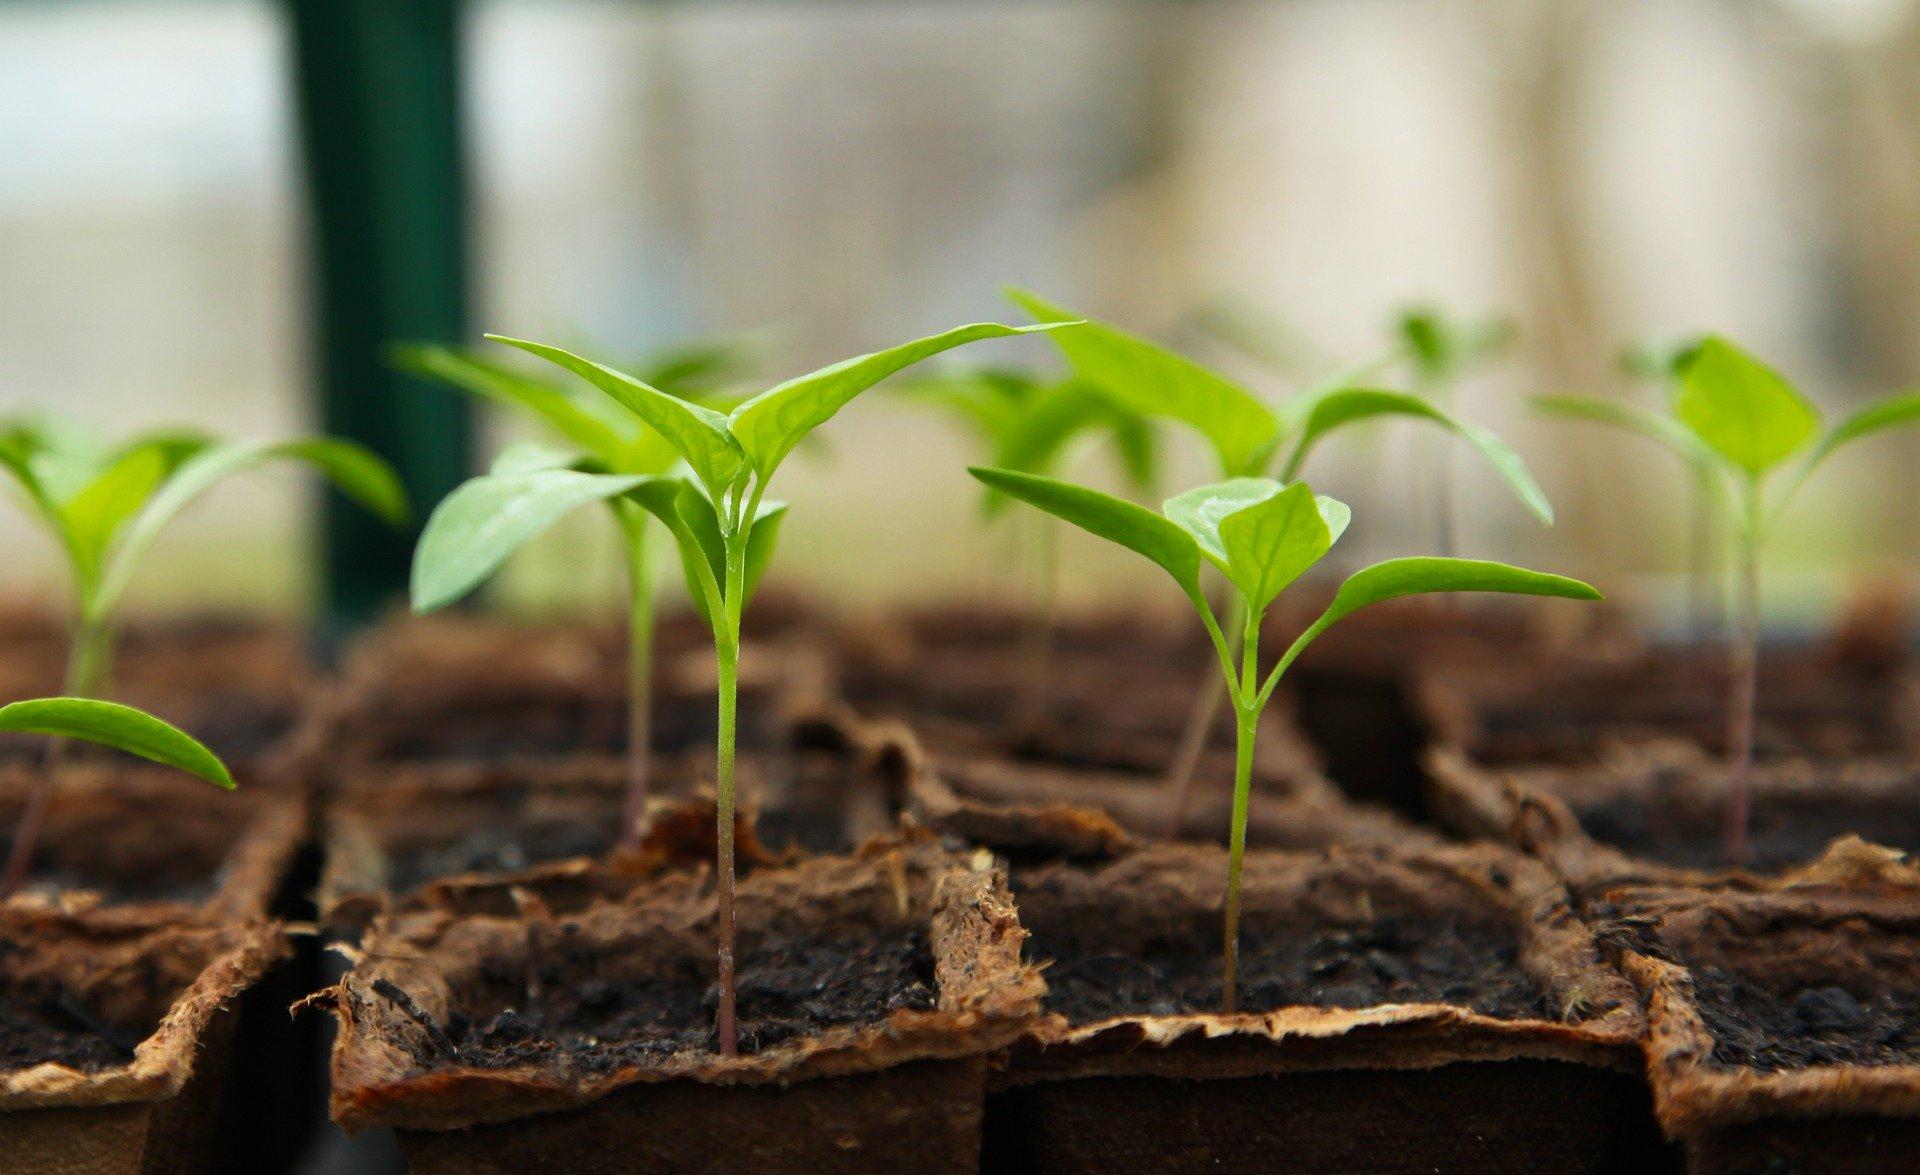 Hardening Off Seedlings and Other Spring Tasks